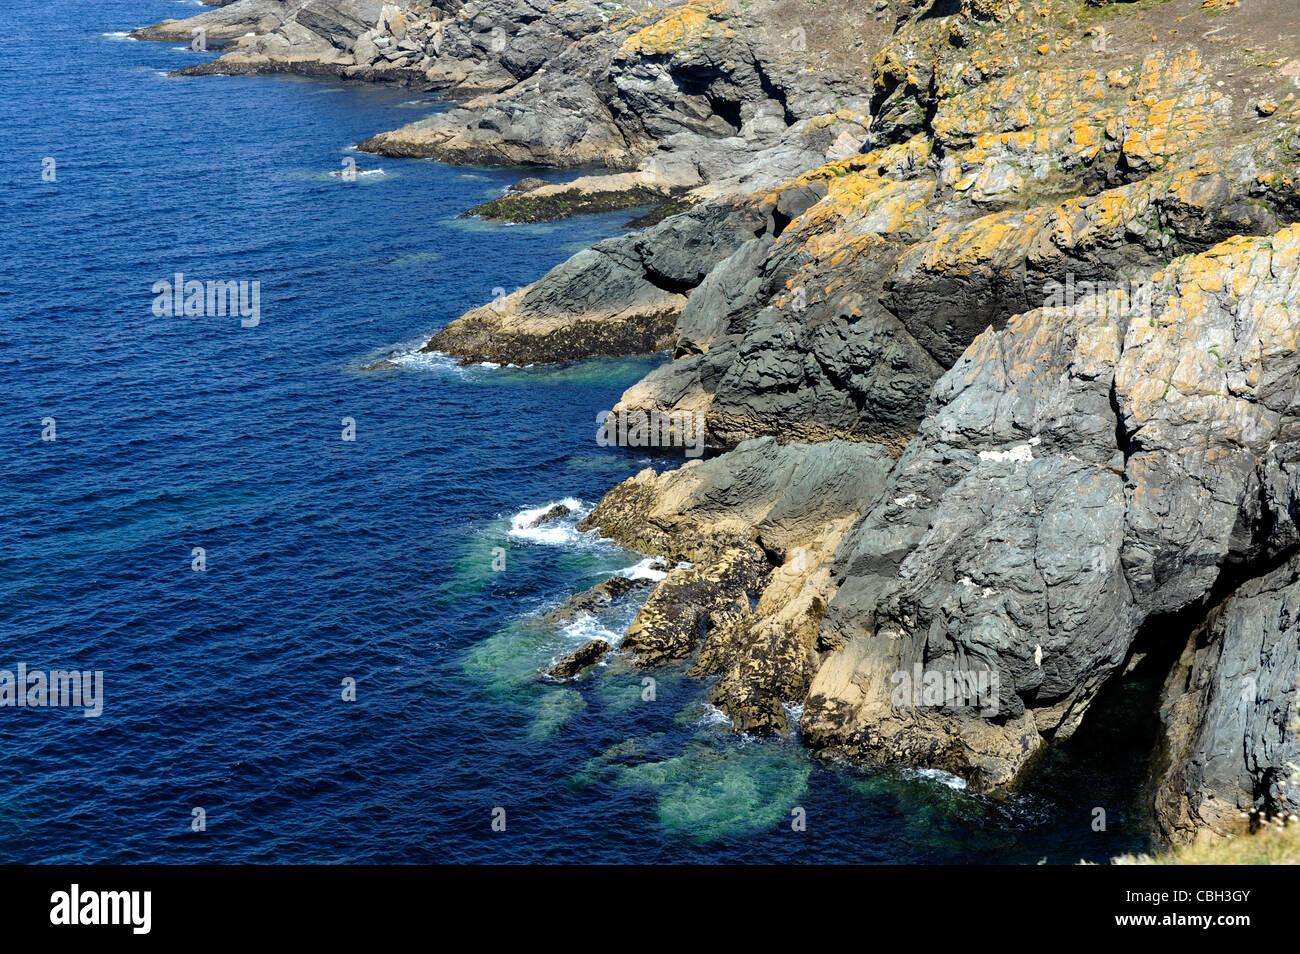 Trou de l'Enfer,Ile de Groix,Island,Morbihan,Bretagne,Brittany,France Stock Photo